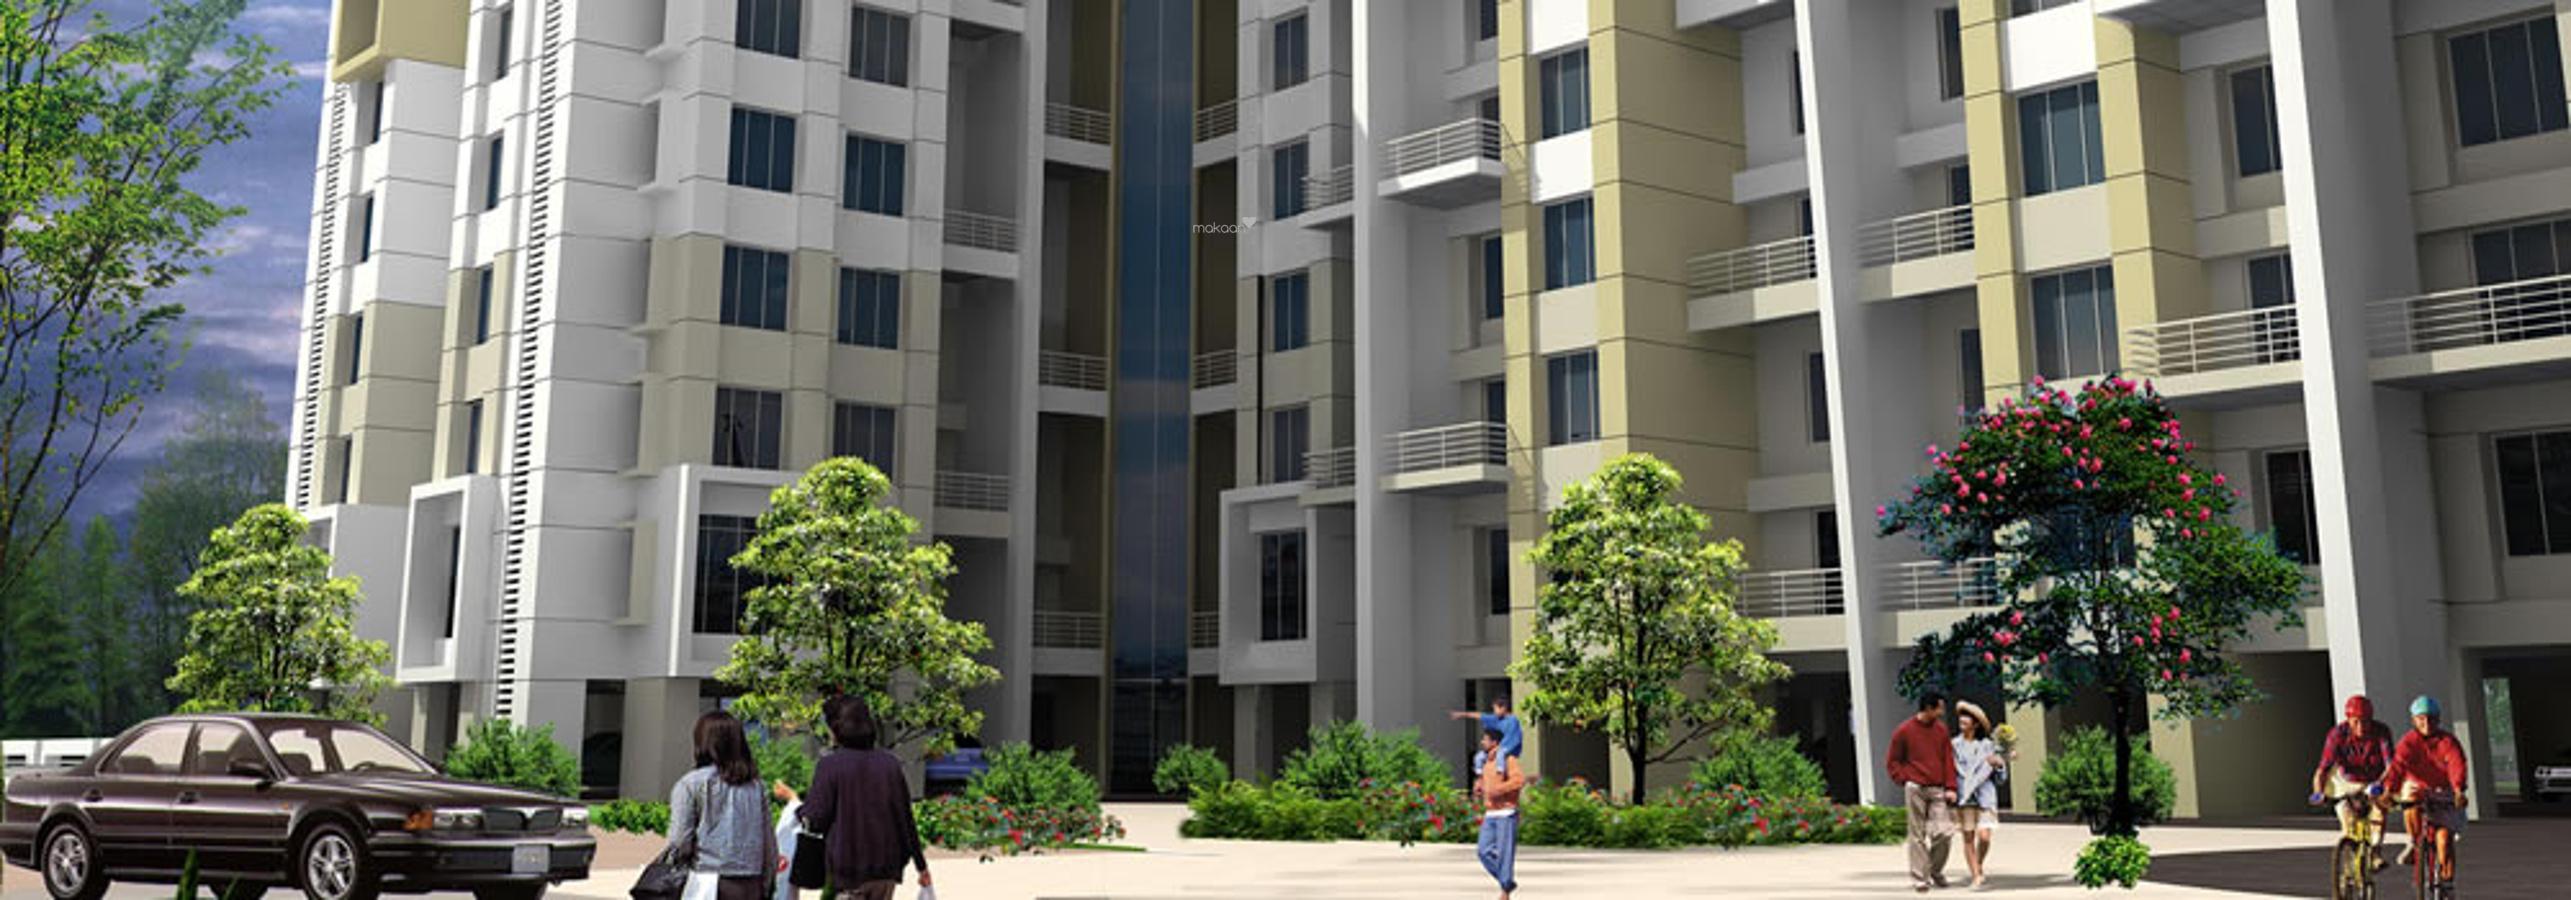 809 sq ft 2BHK 2BHK+2T (809 sq ft) Property By Raviraj Real Estate In Sara, Baner